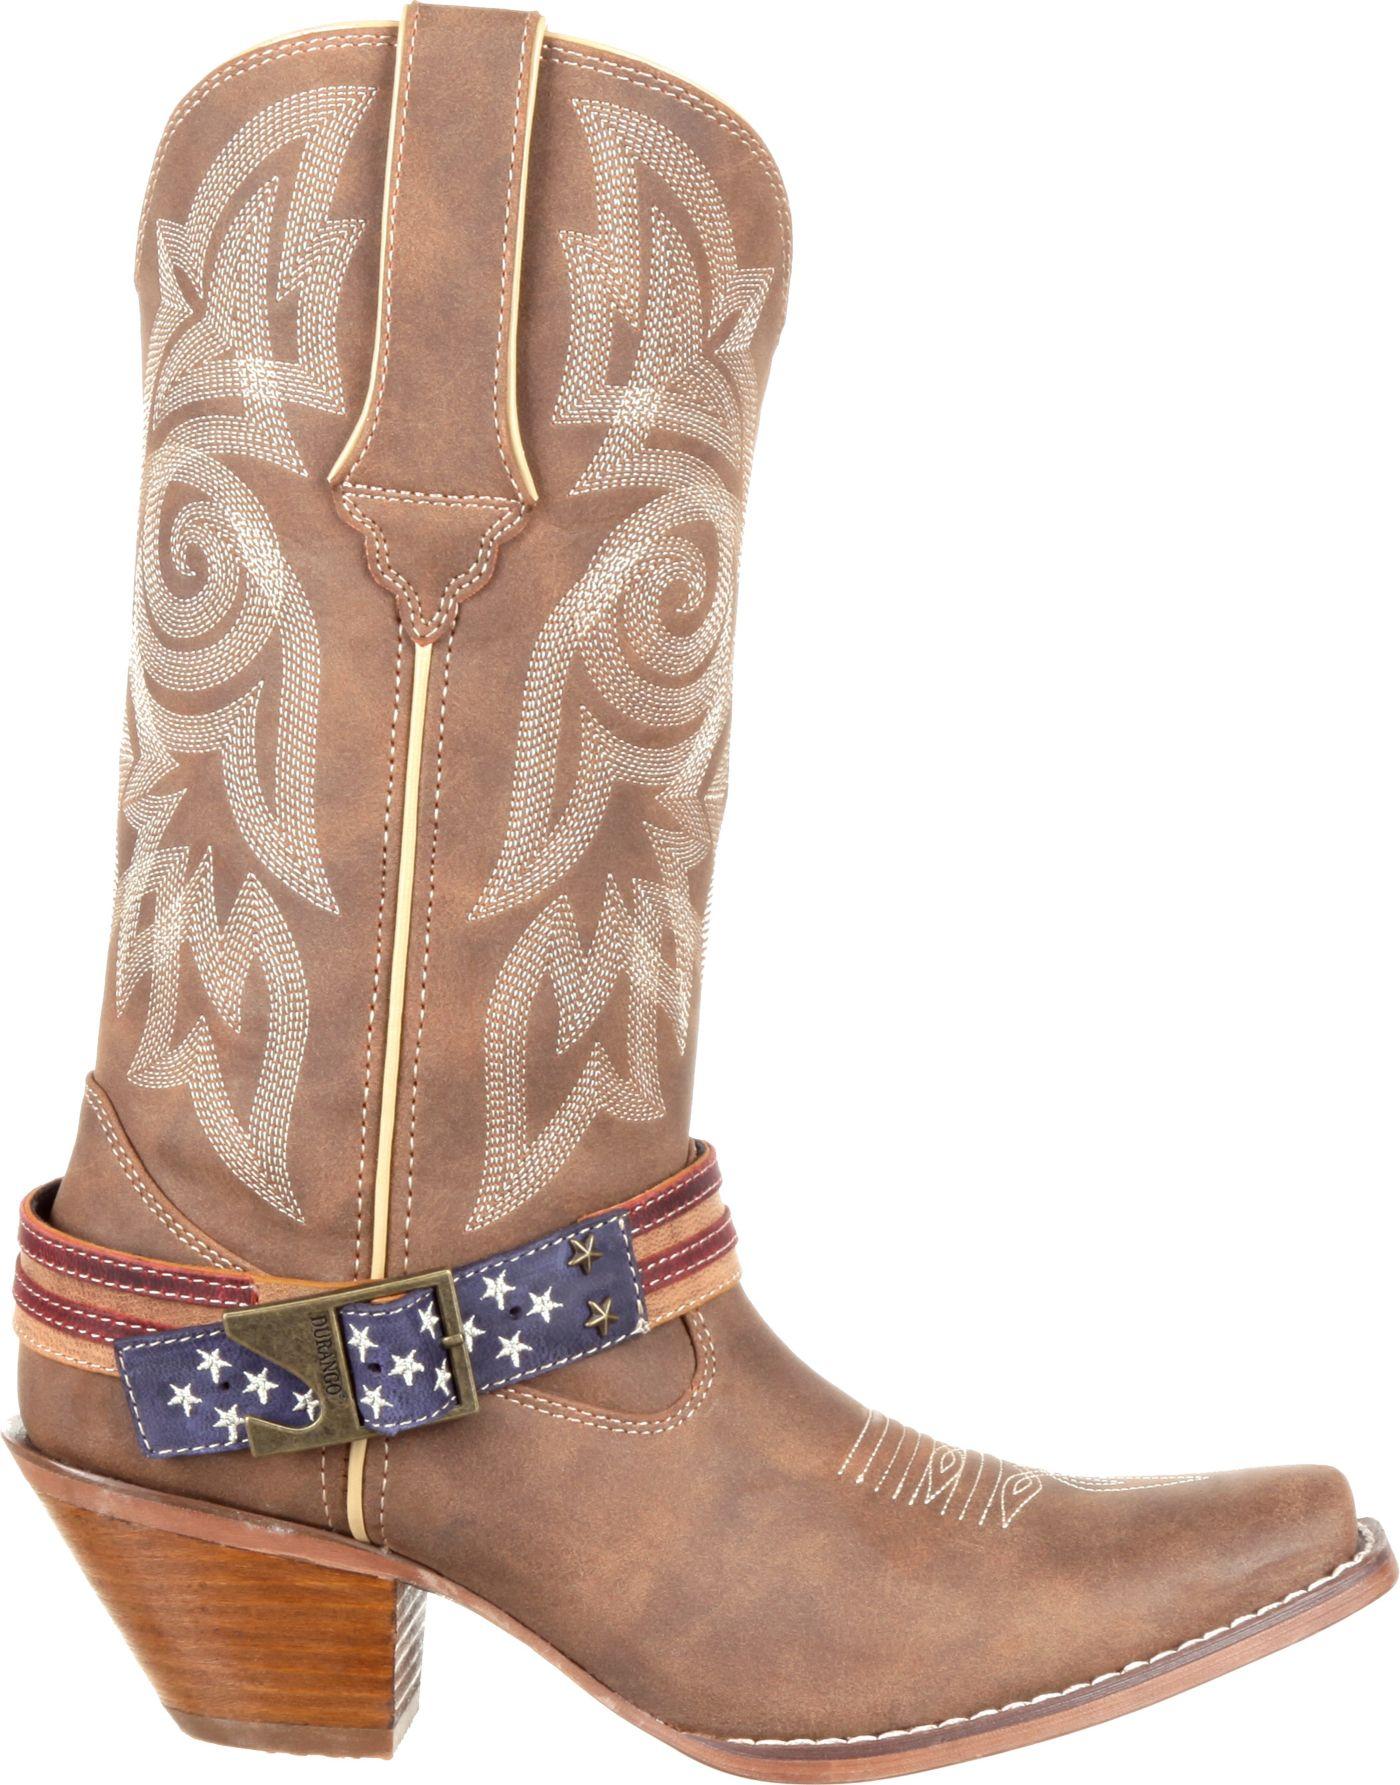 Durango Women's Crush Flag Accessory Western Boots